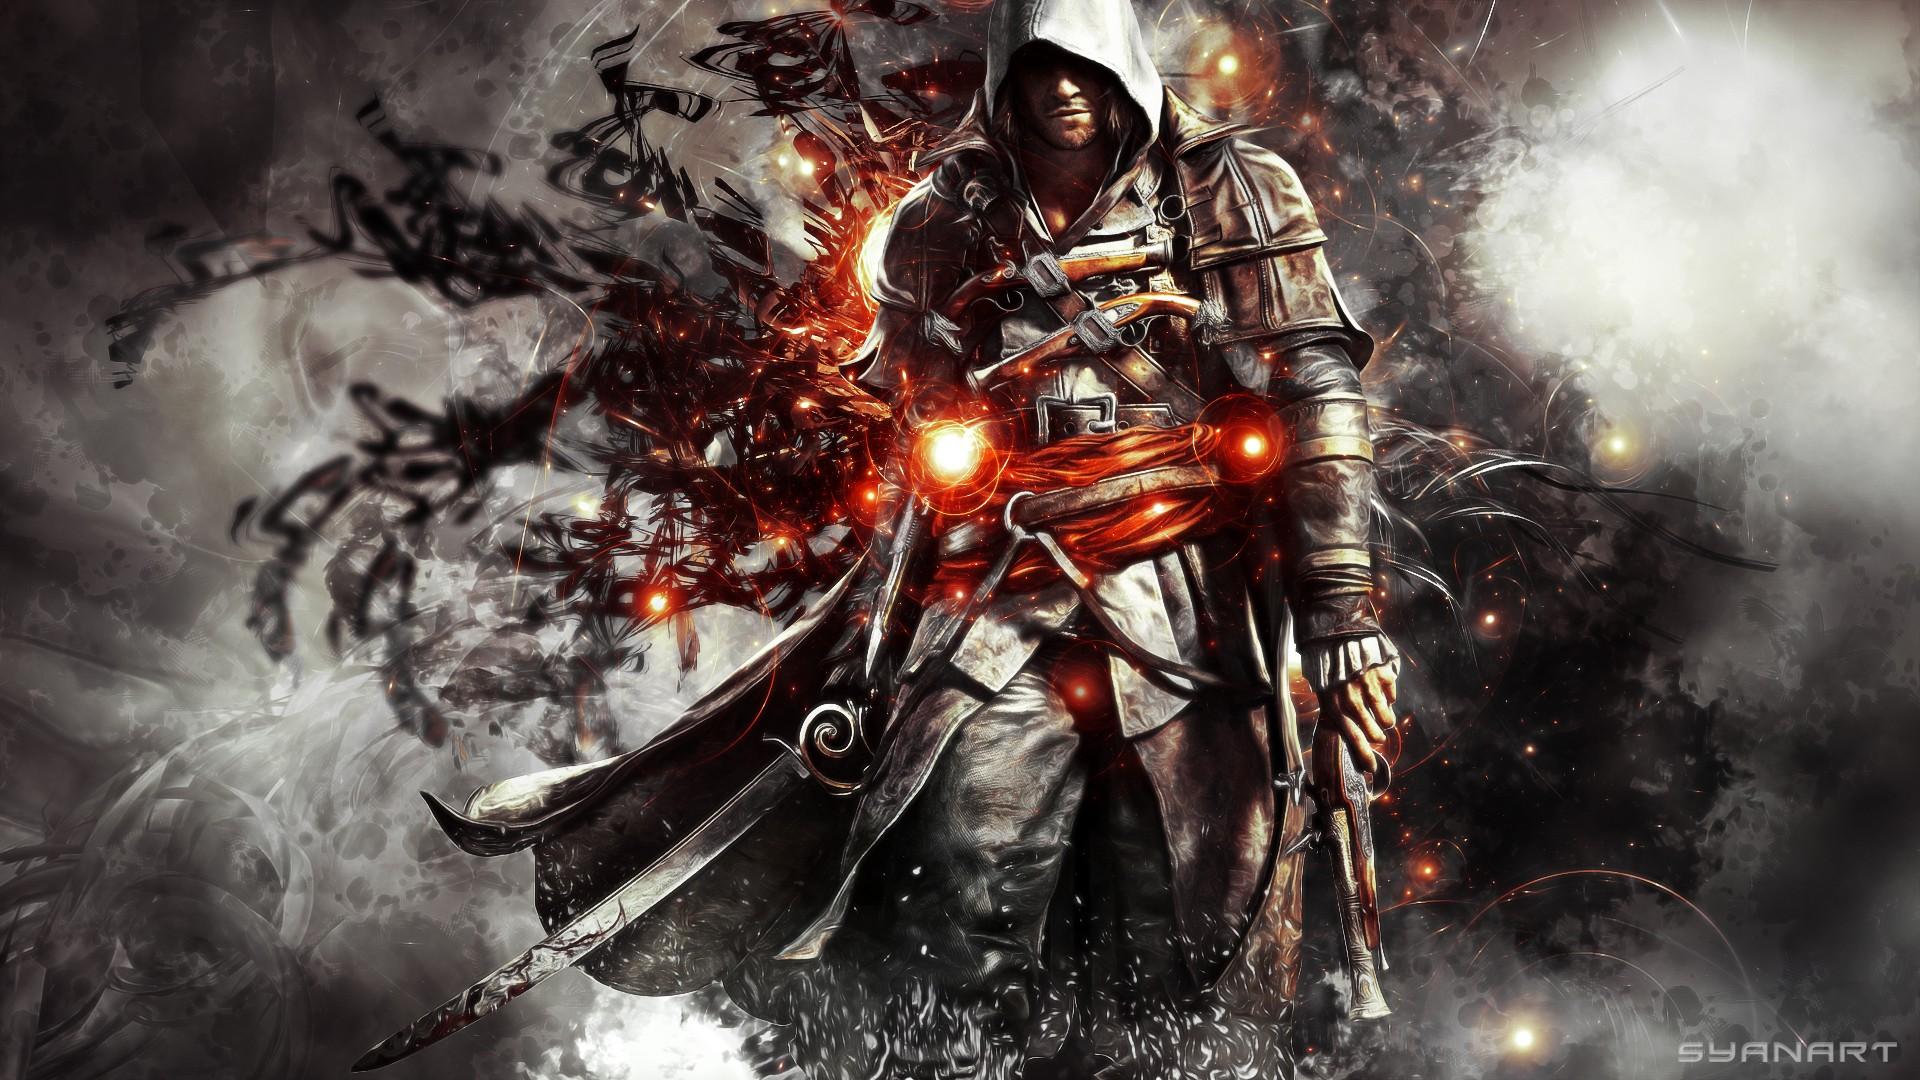 Assassins Creed Iv Black Flag Hd Wallpaper Background